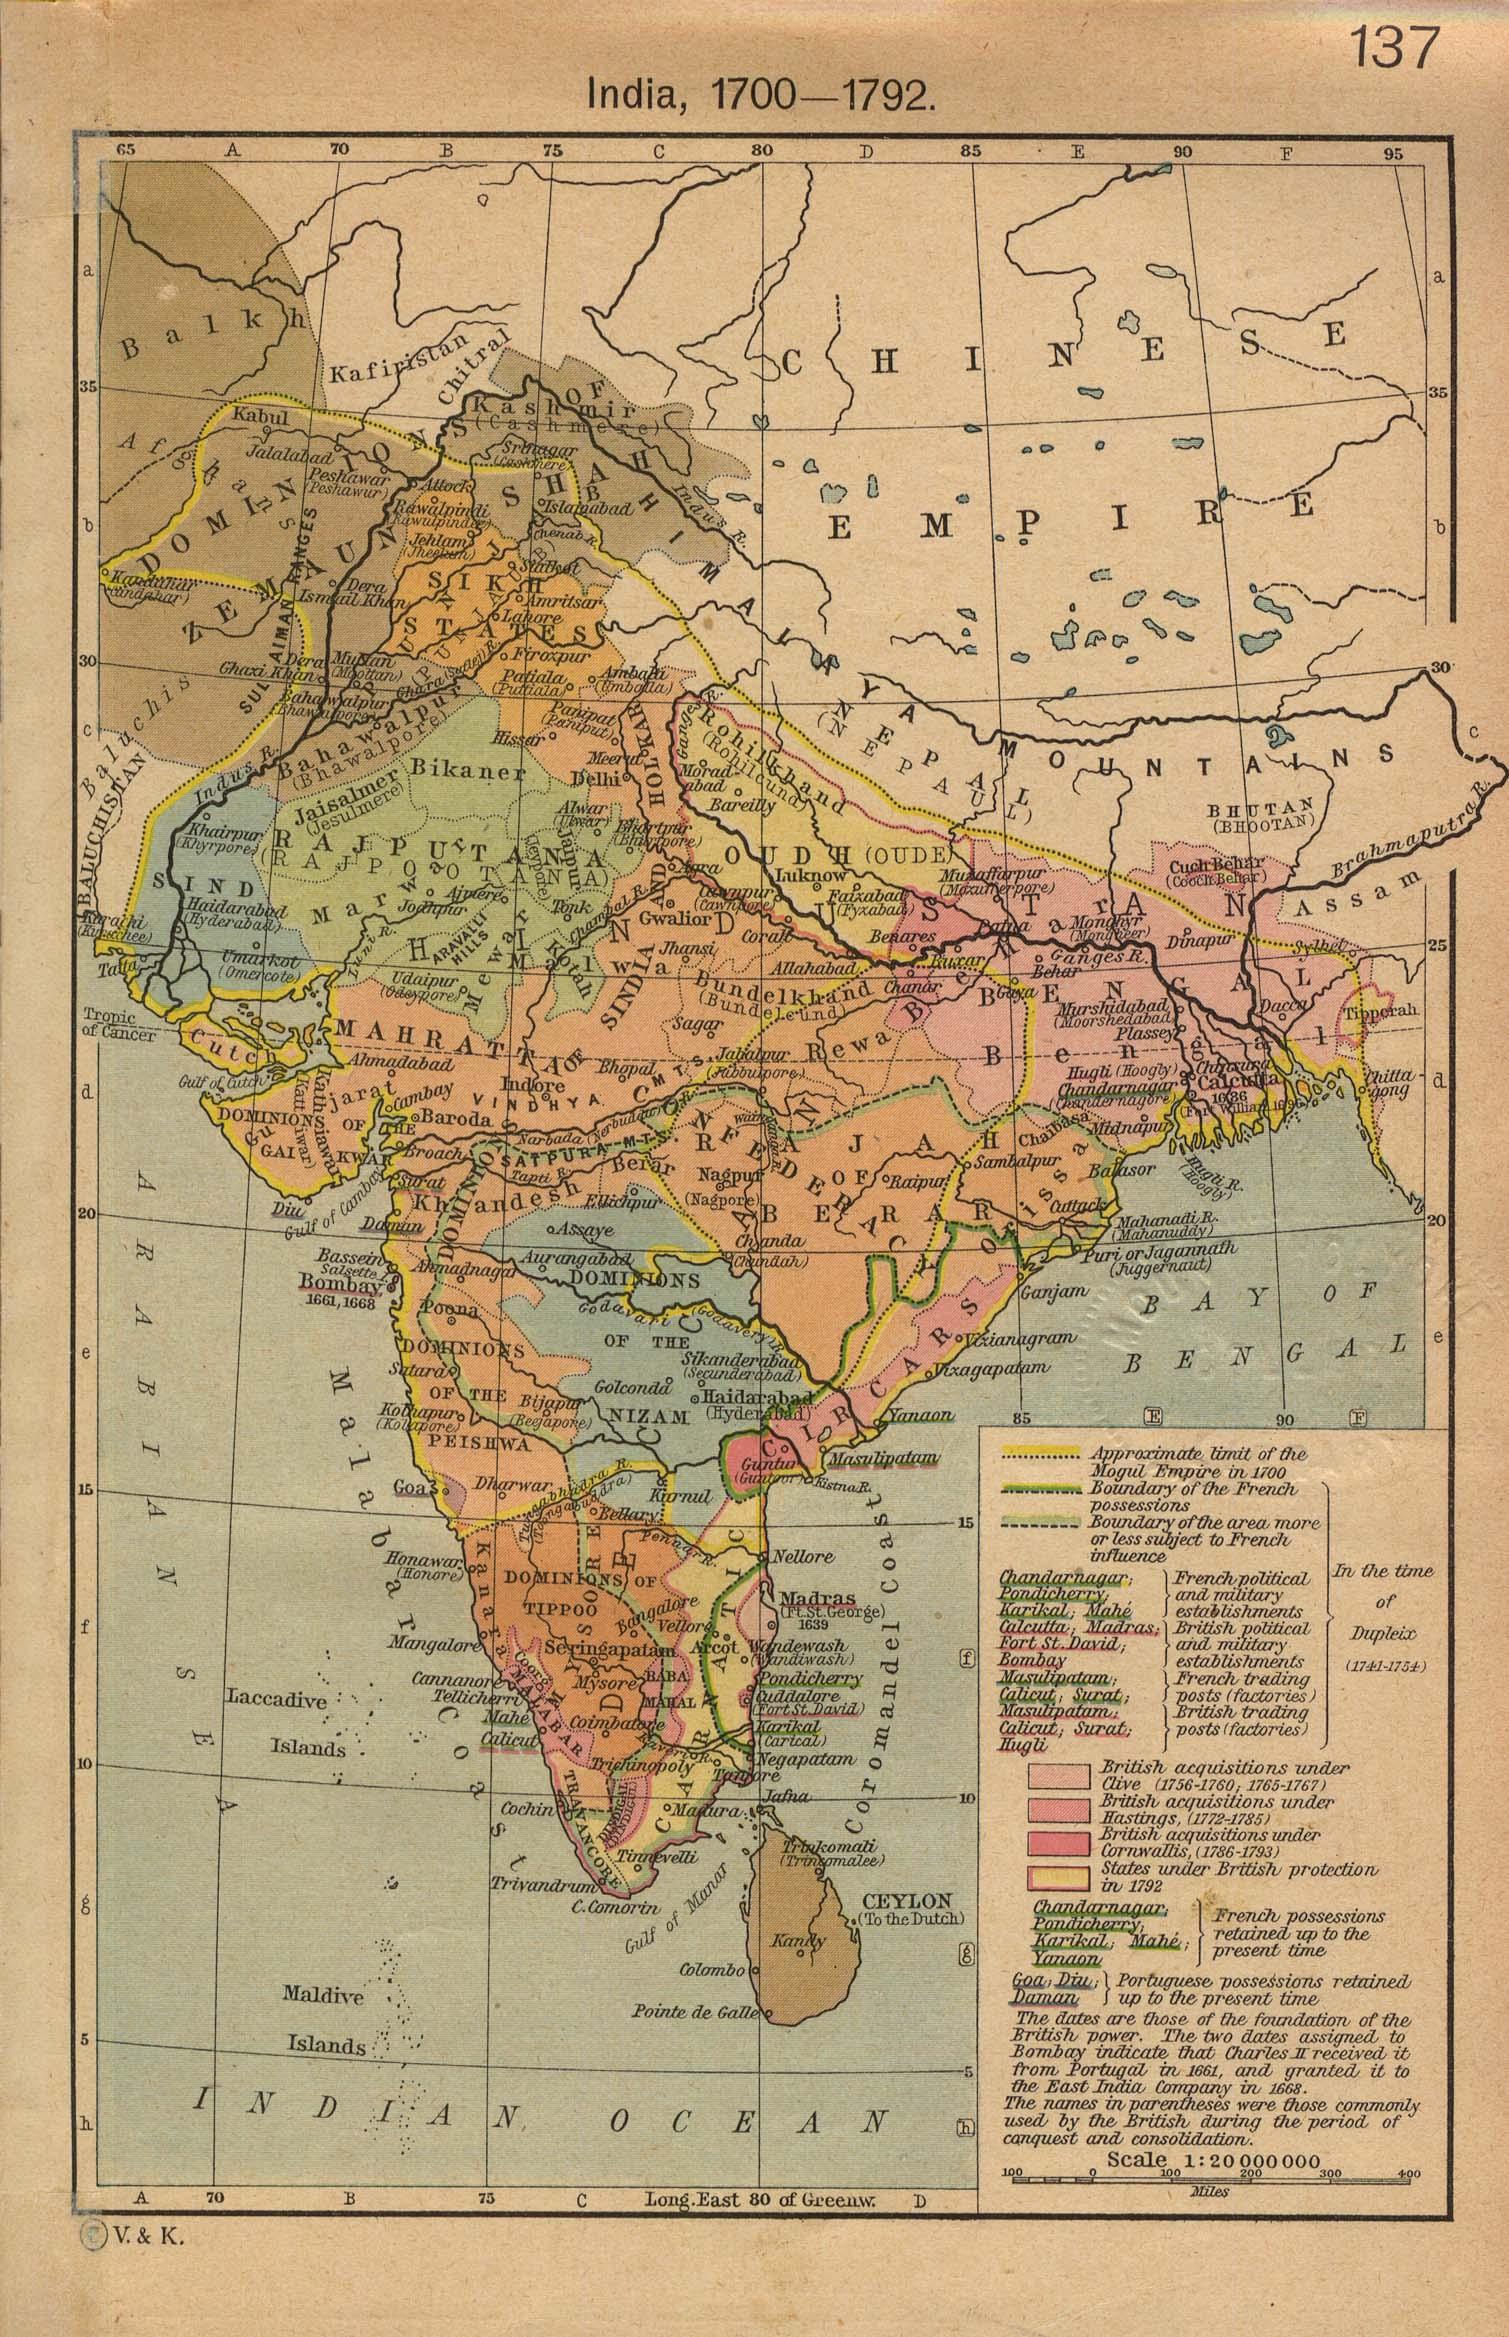 Mapa de India 1700 - 1792